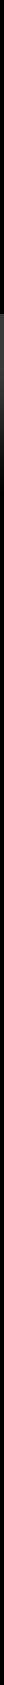 black_background_repeat1.jpg